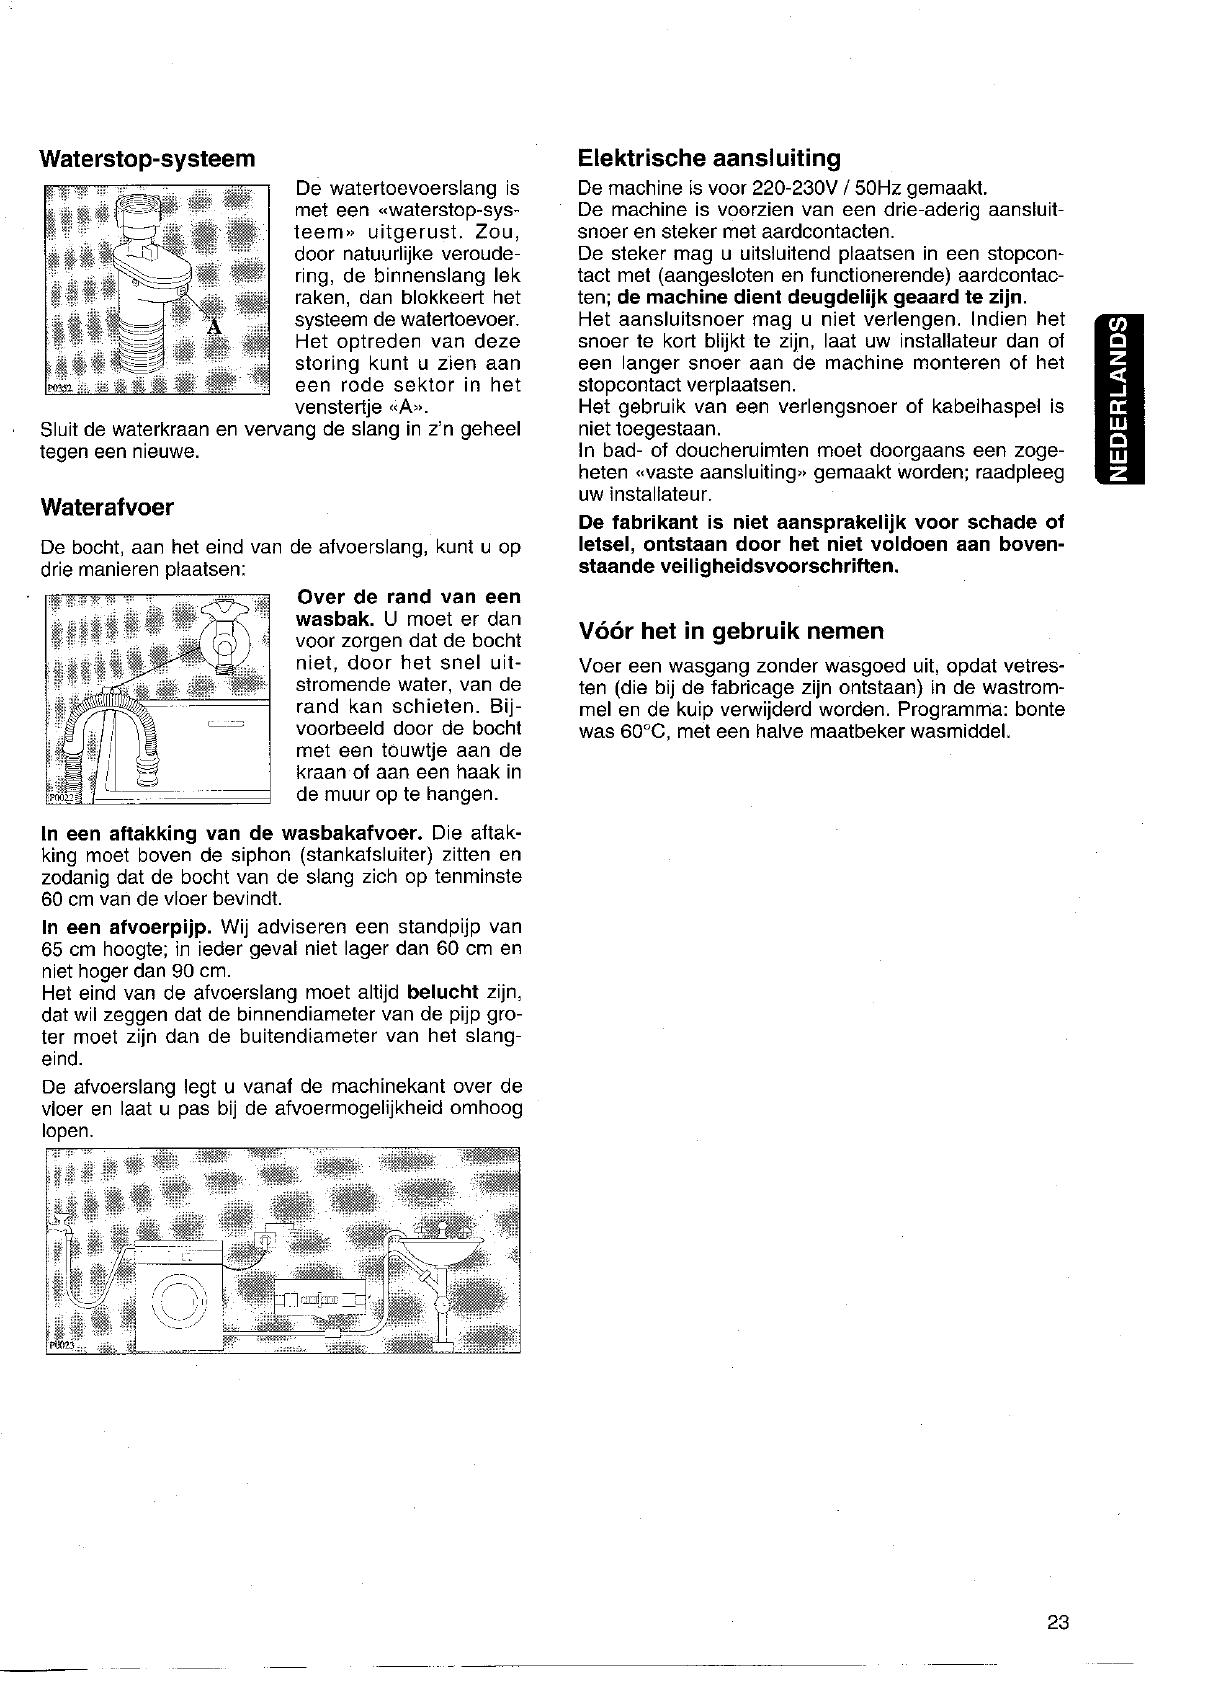 Handleiding Zanker Lf 2540 Lavita Pagina 5 Van 18 Nederlands